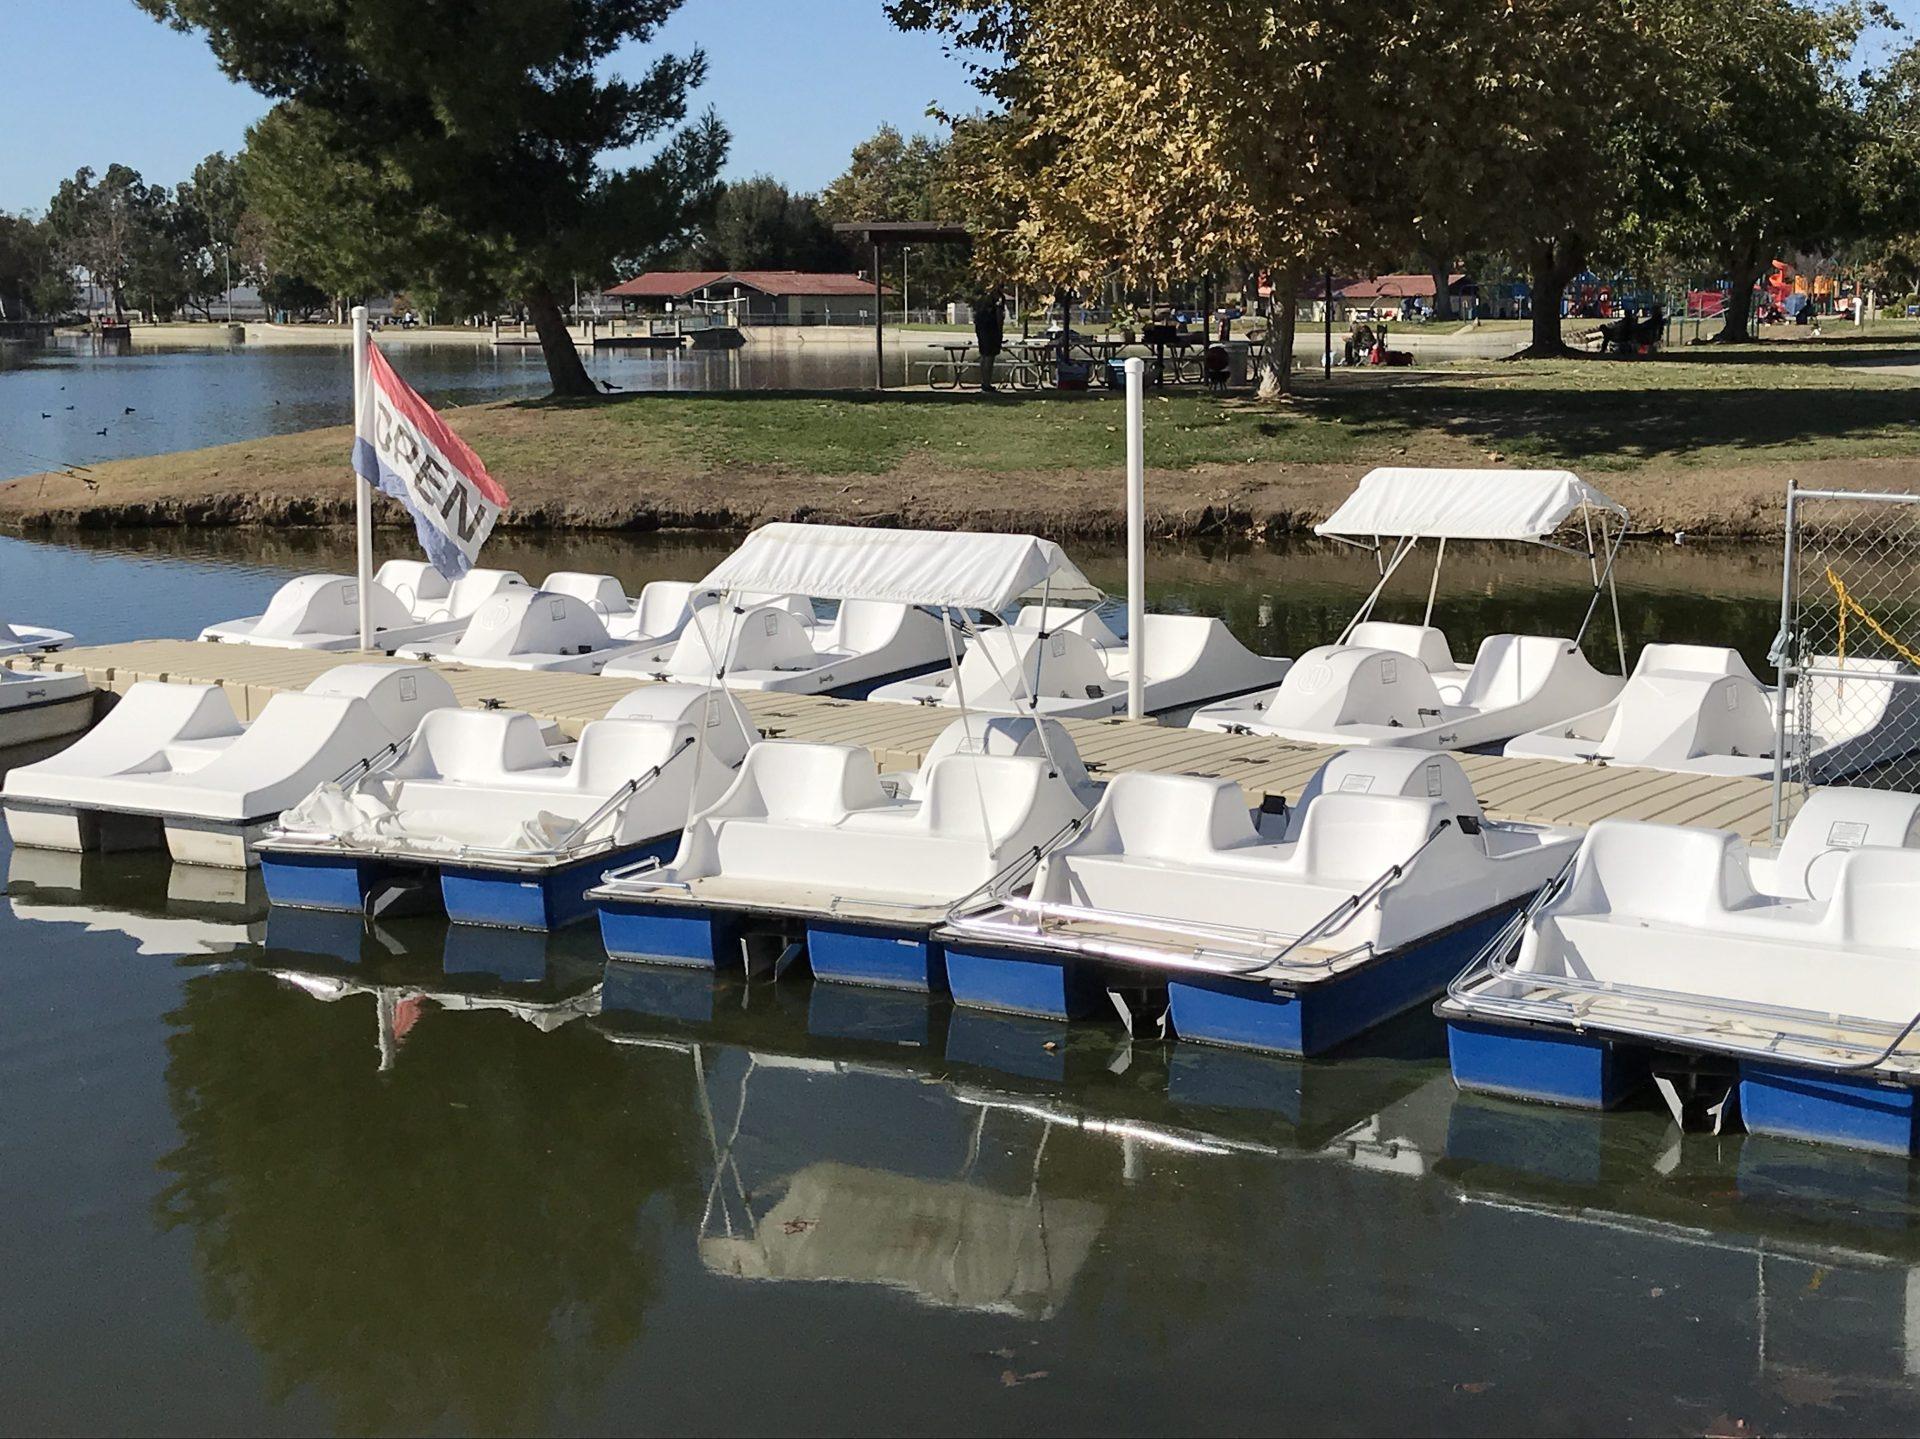 Peddle Boats at Guasti Park